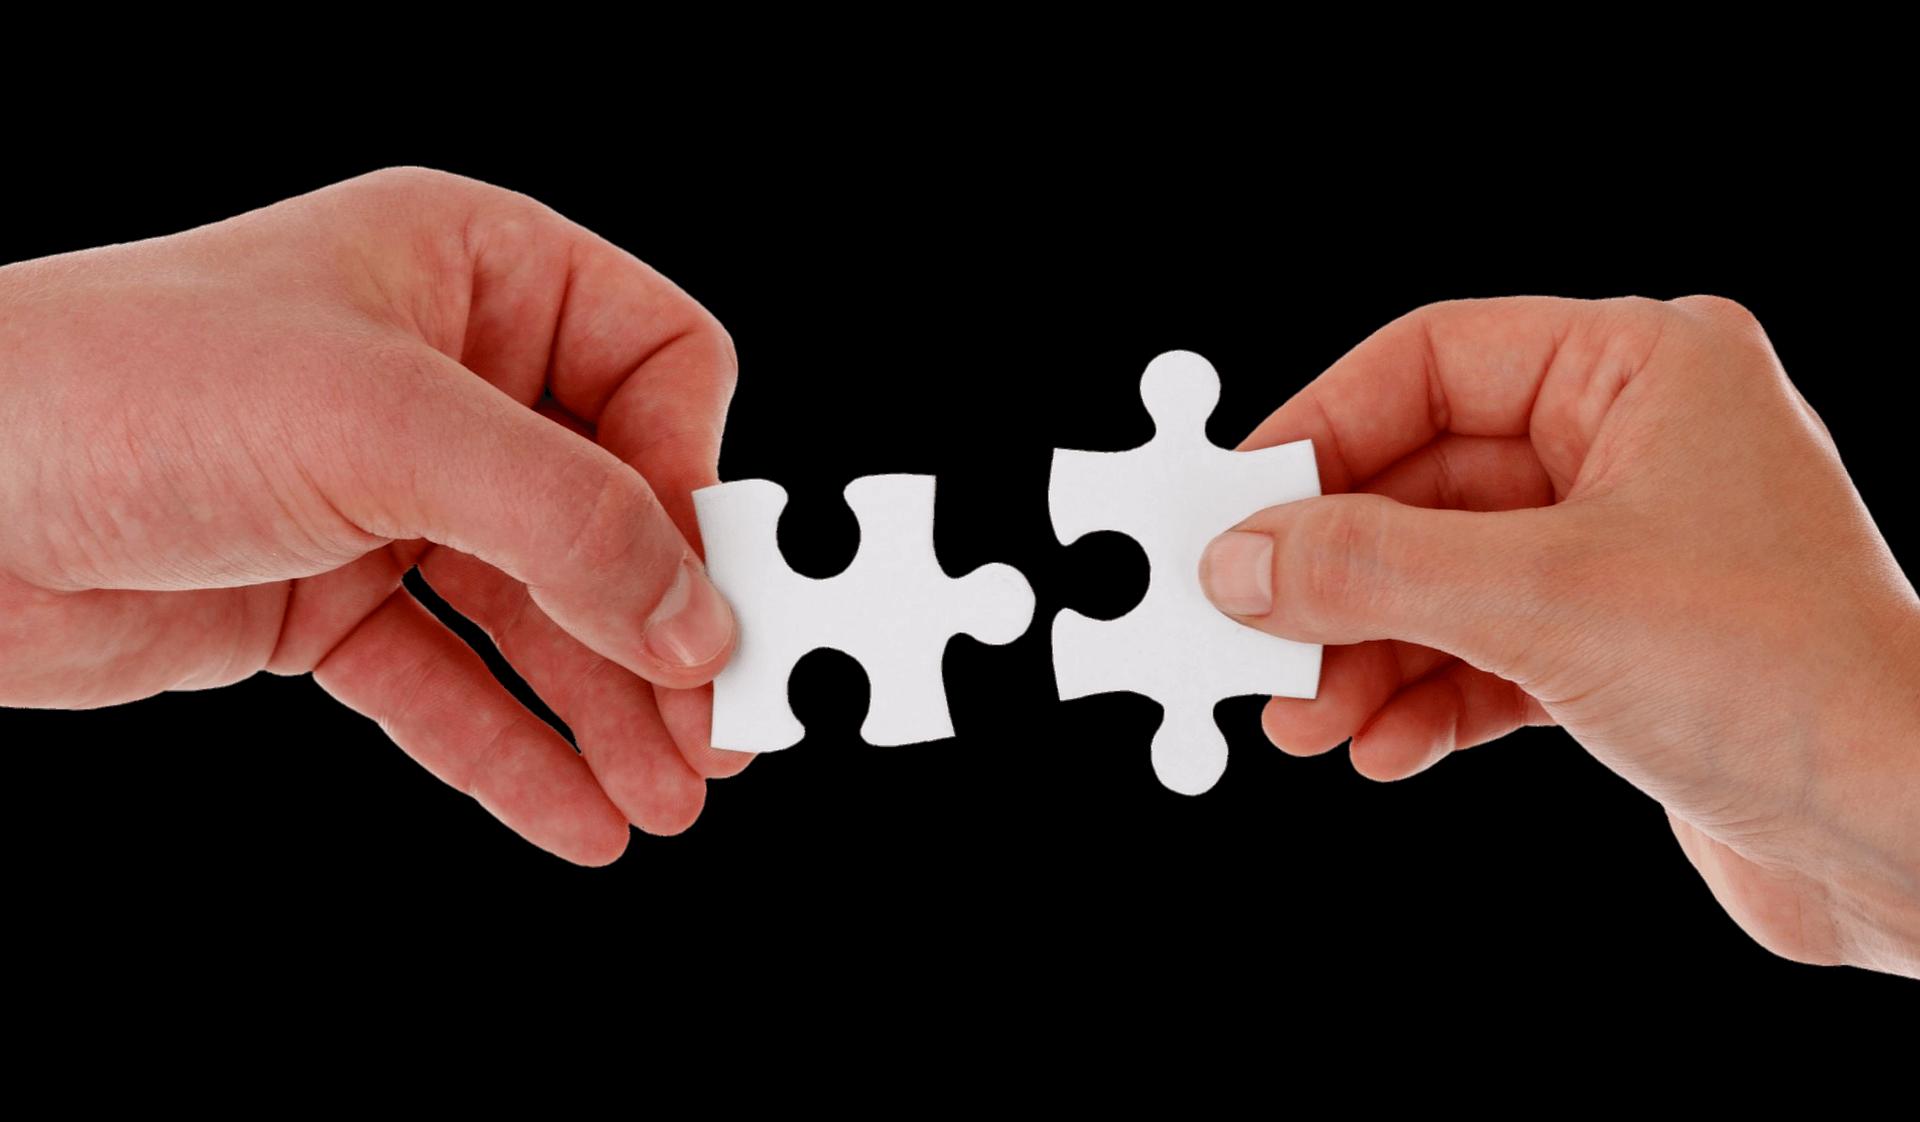 Evalueserve Helps FinTech Major Solidify Innovation Pipeline through Strategic Partner Identification